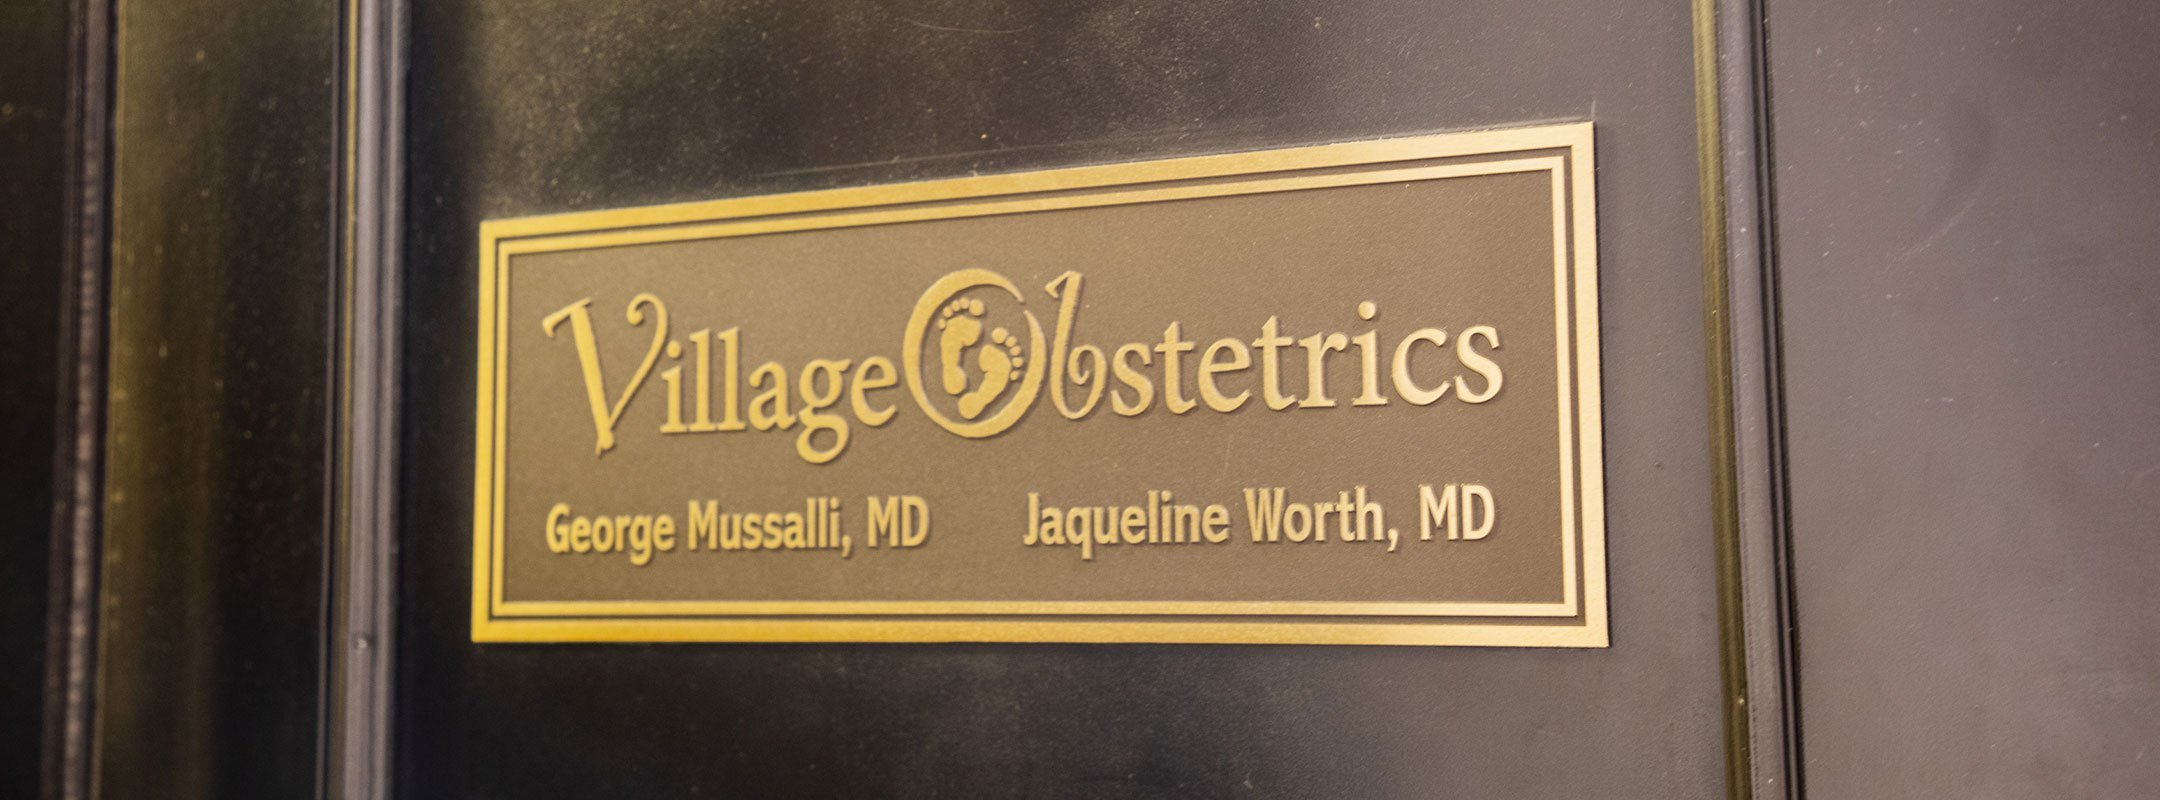 Village-Obstetrics-Park-Avenue-NYC